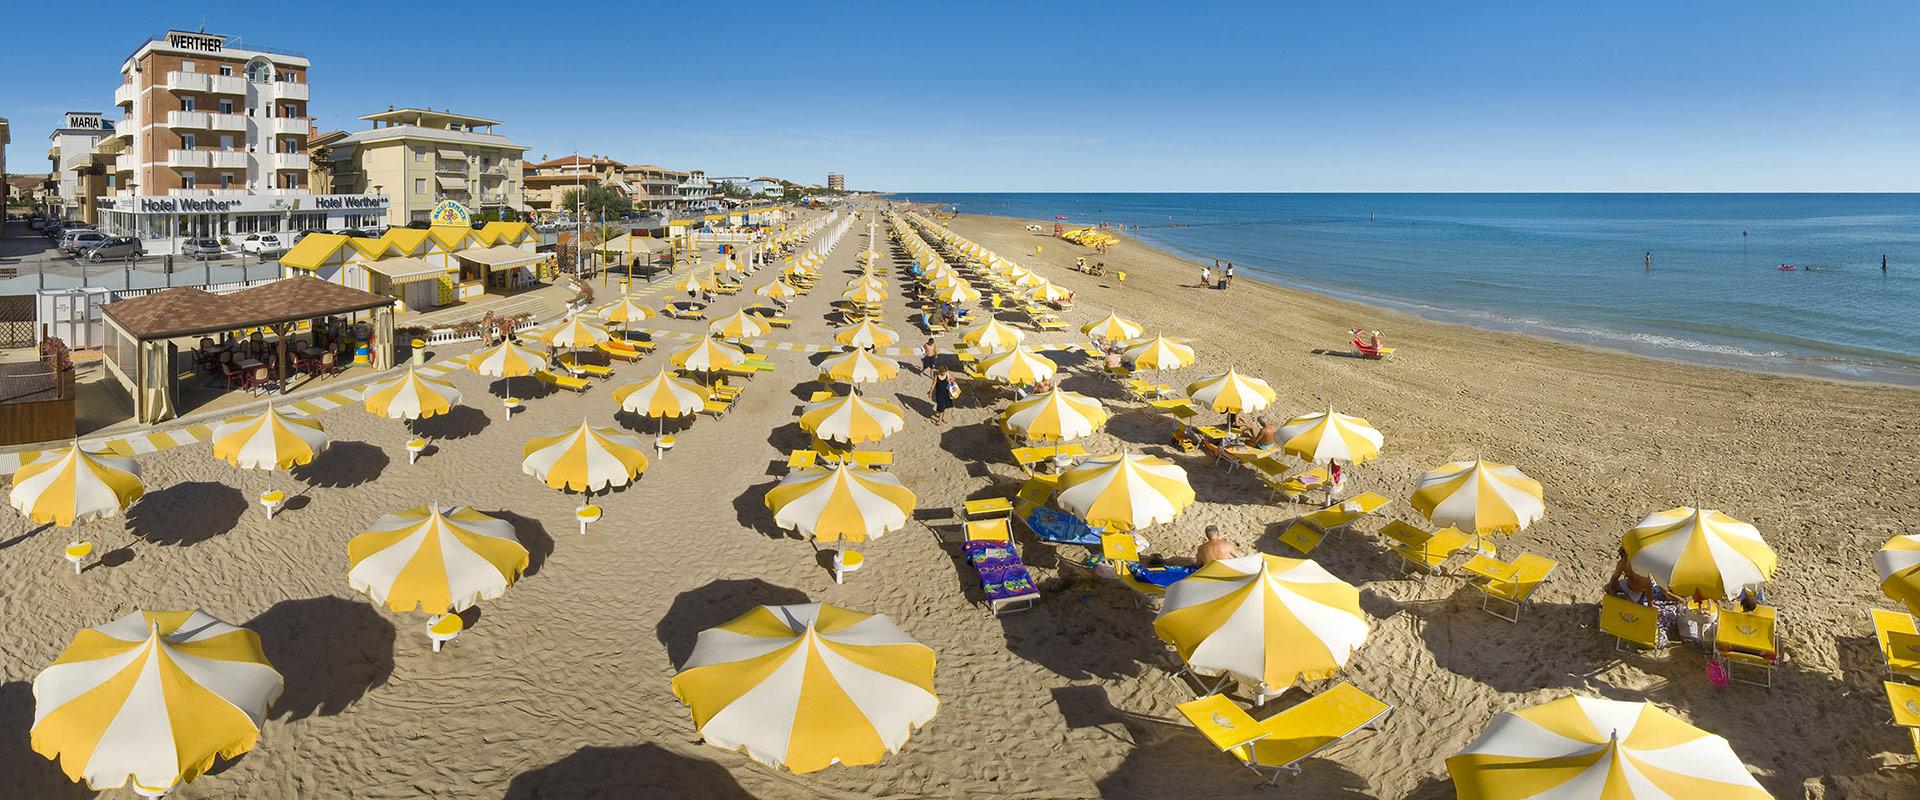 Hotel on the Adriatic Sea